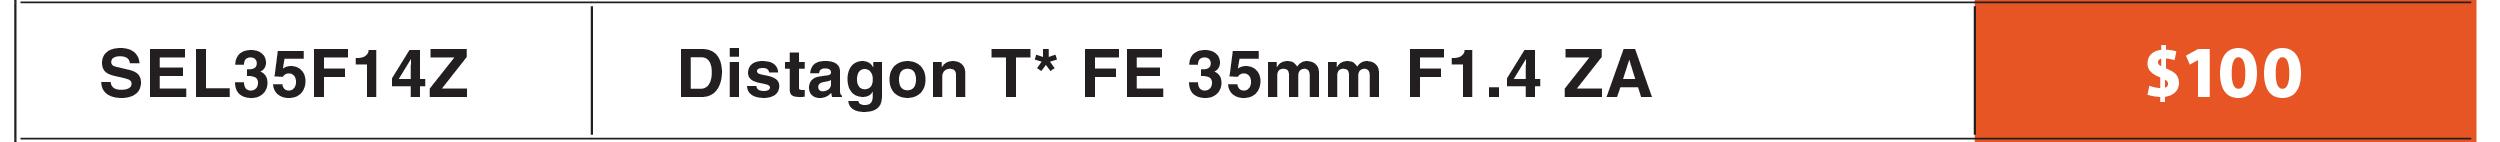 Sony FE 35mm f/1.4